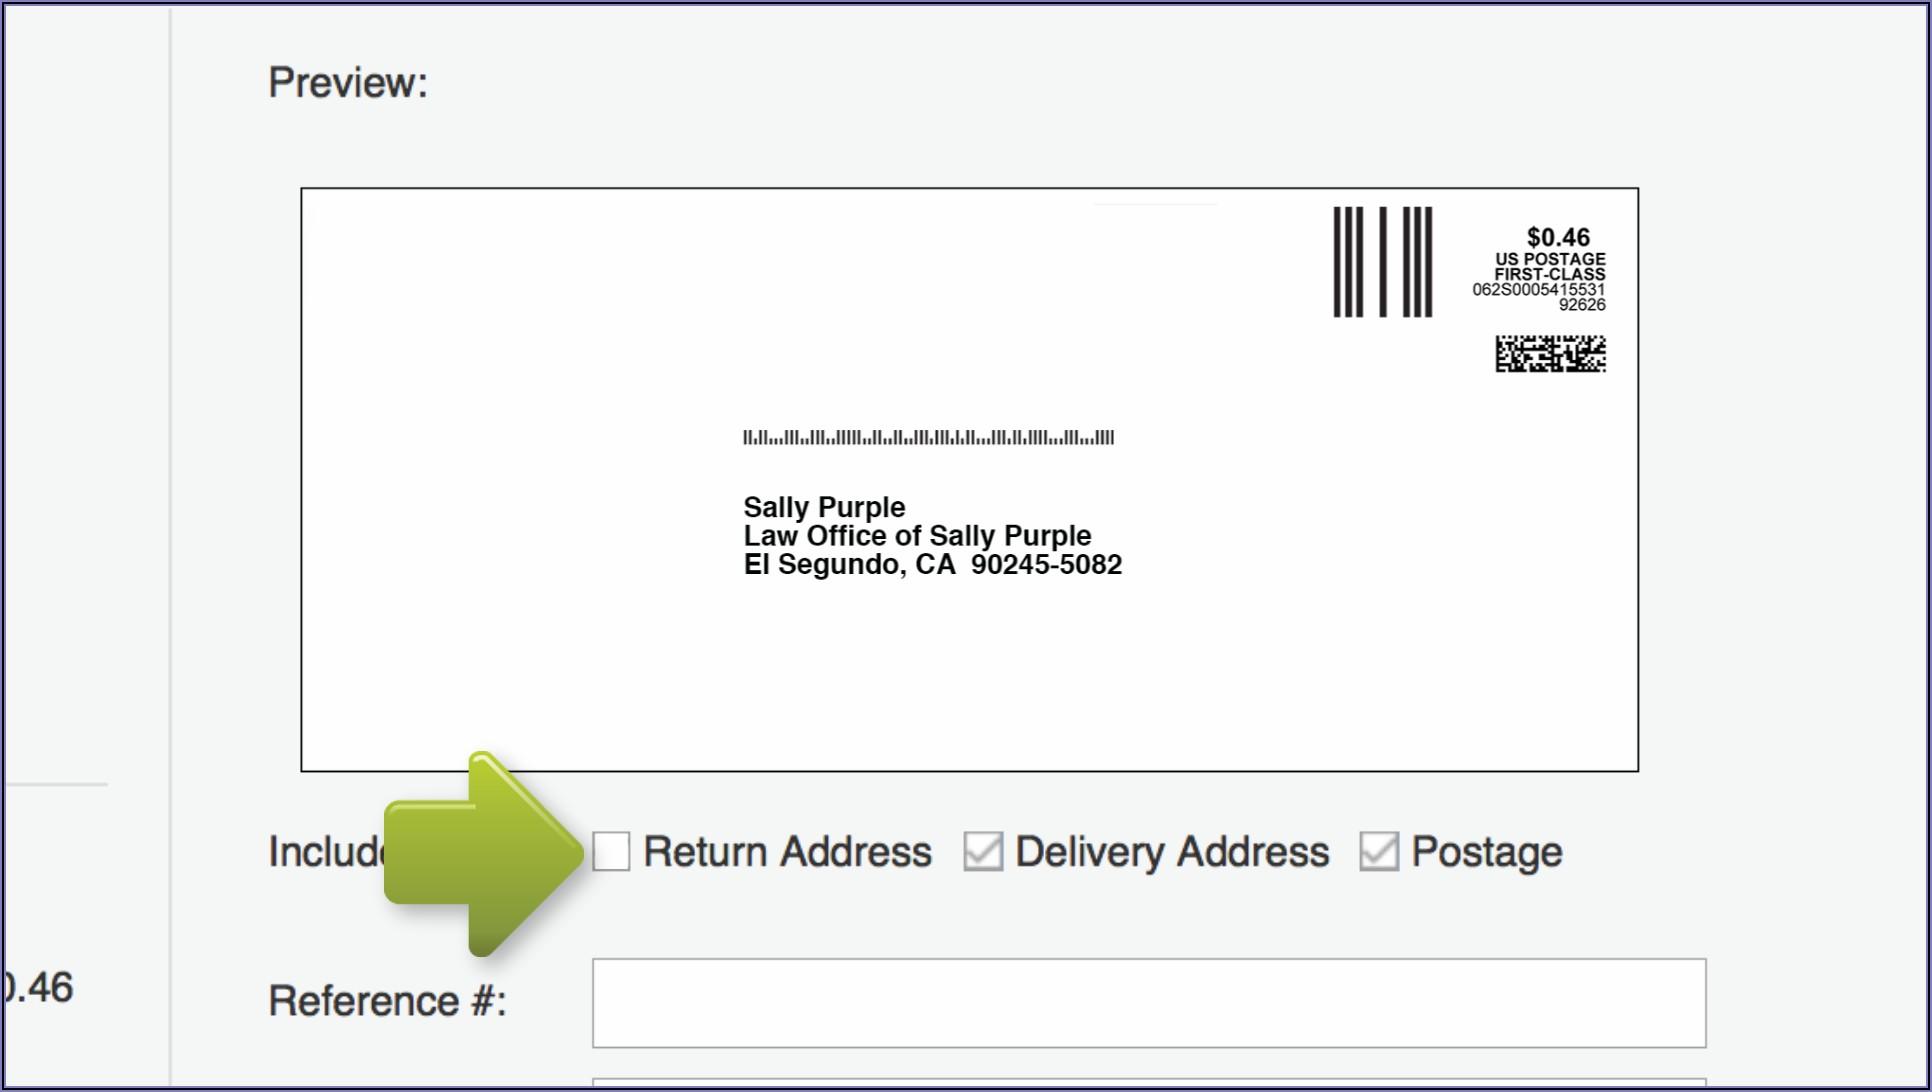 Postage For 9x12 Envelope 8 Oz